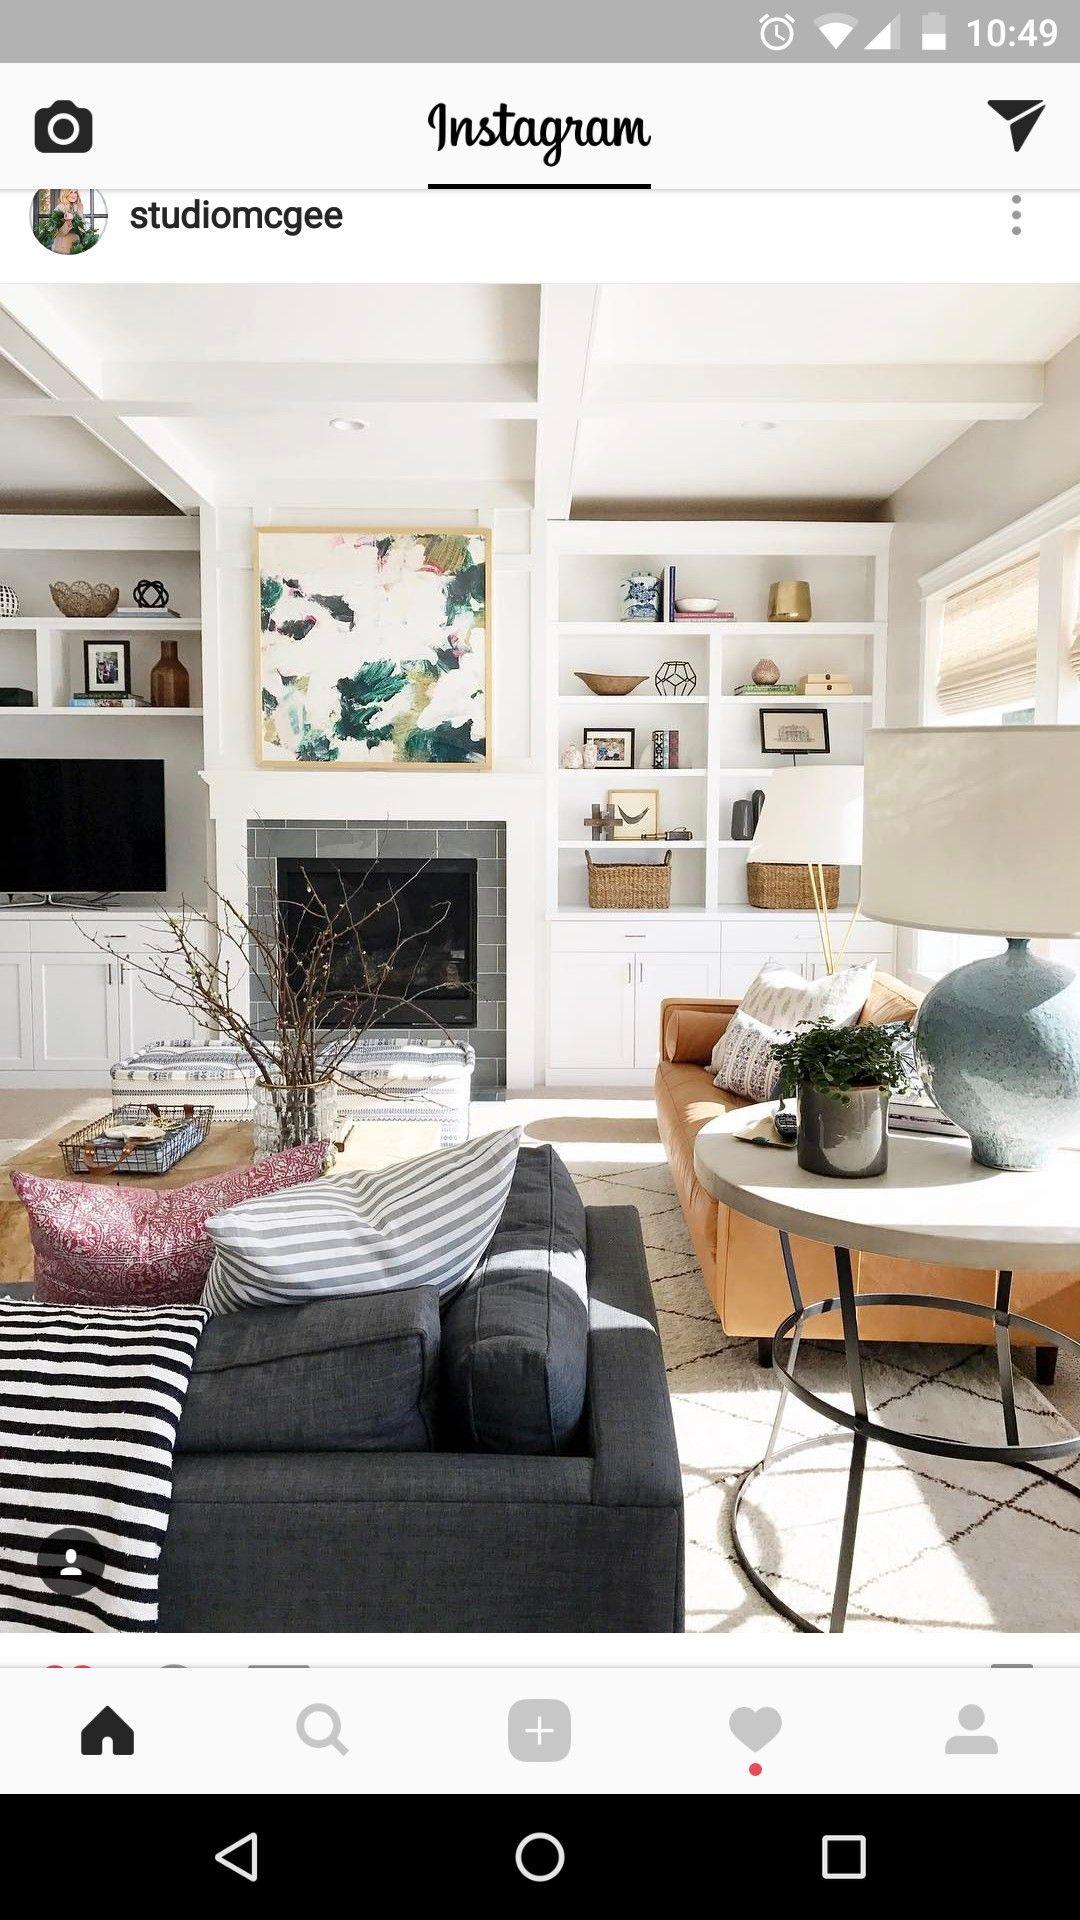 Pin by Naomi Benatar on house inspo | Pinterest | Living rooms, Room ...